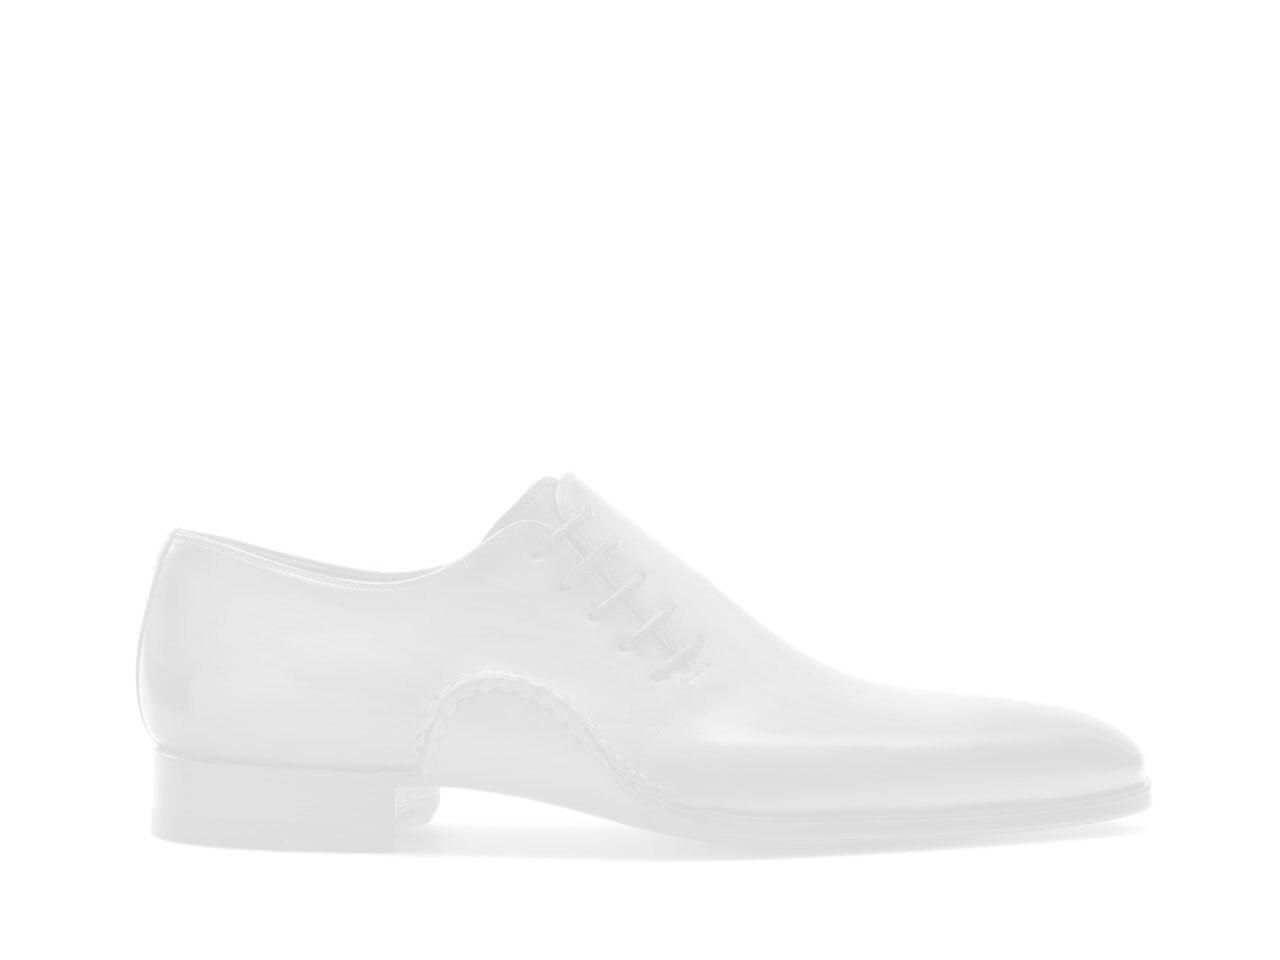 Pair of the Magnanni Óscar Black Men's Oxford Shoes